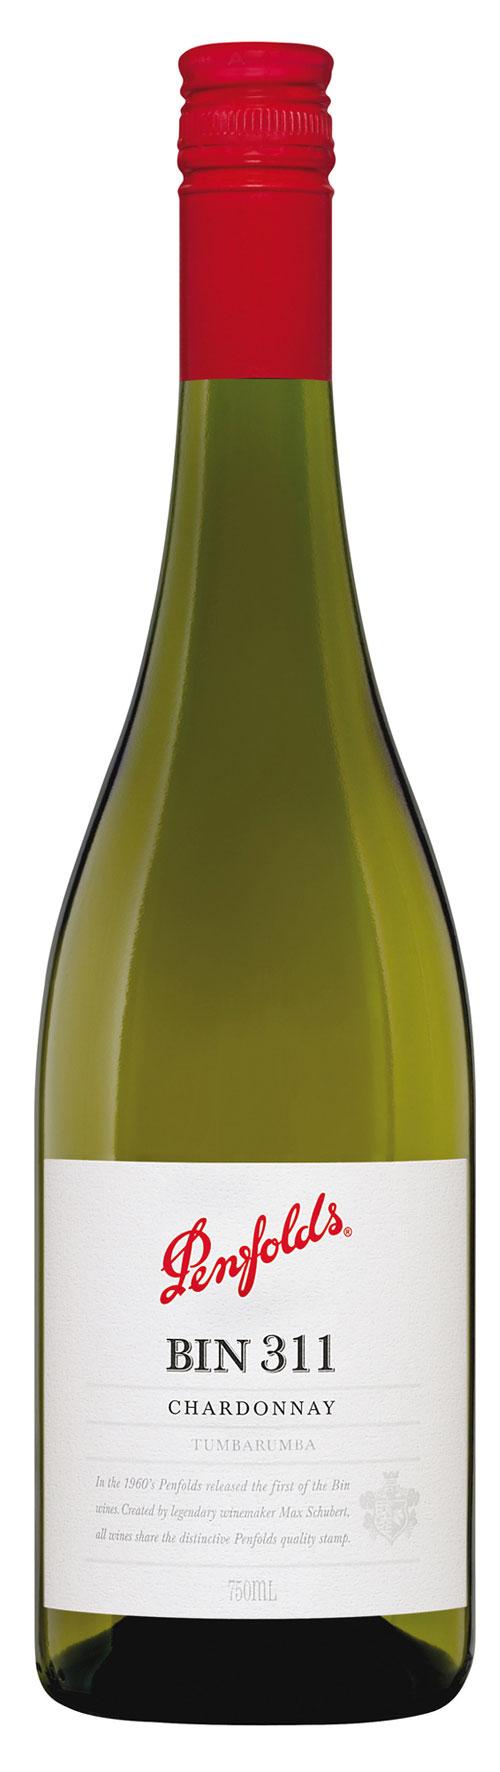 Penfolds Bin 311 Chardonnay Tumbarumba 2019